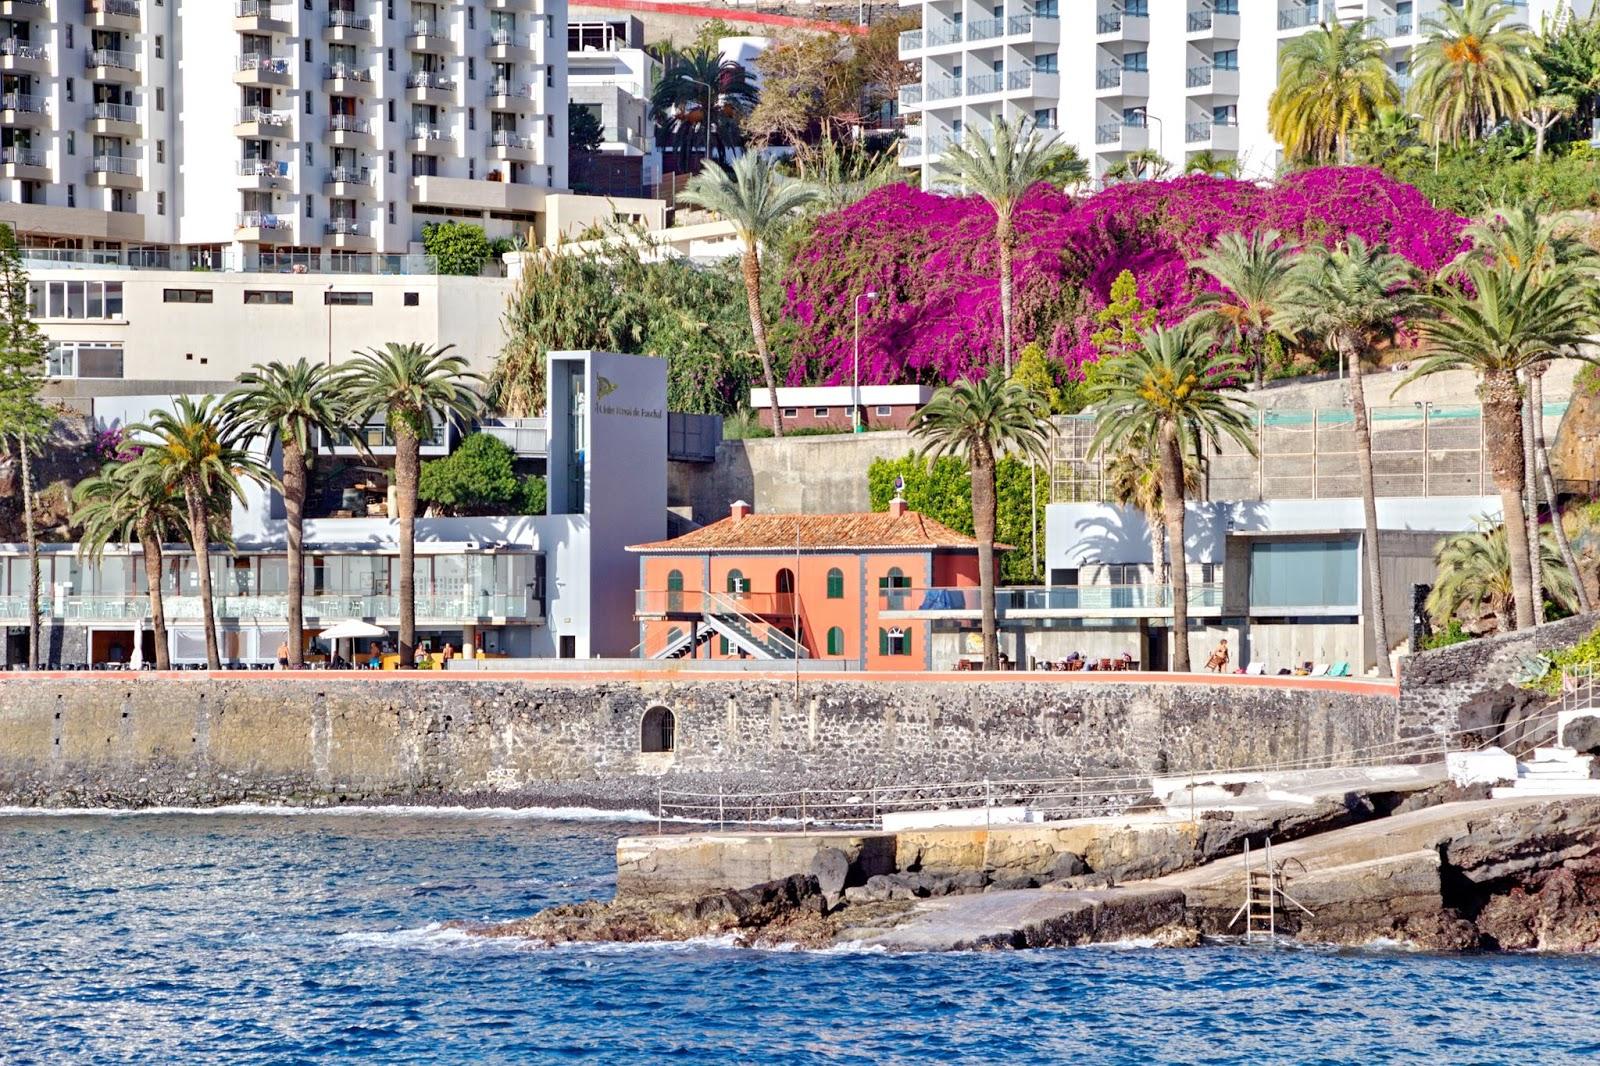 o Clube Naval do Funchal